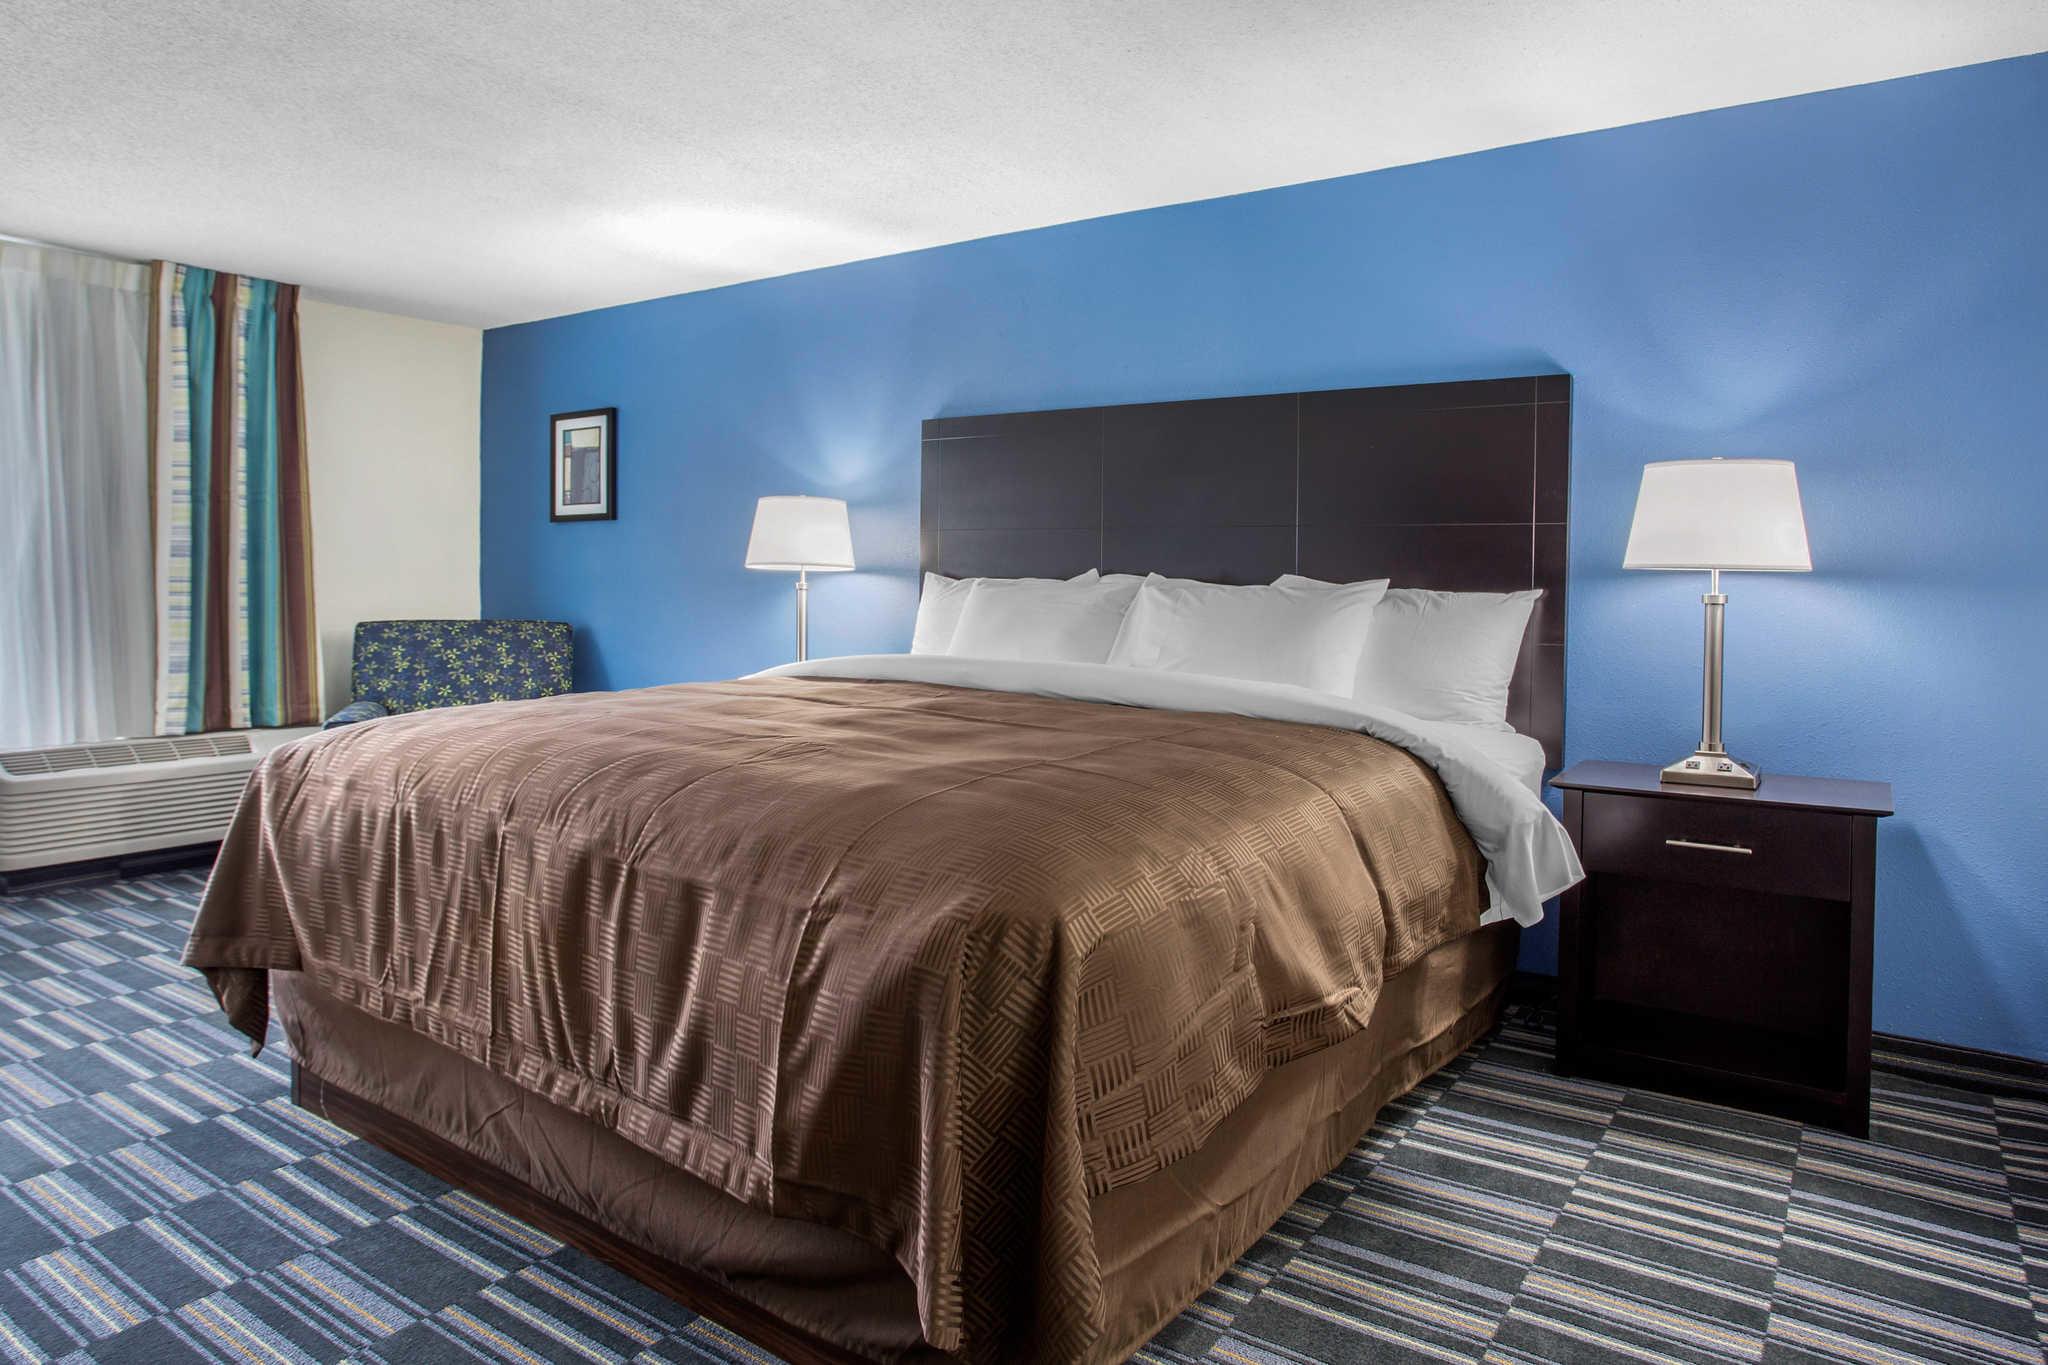 Clarion Inn & Suites image 18